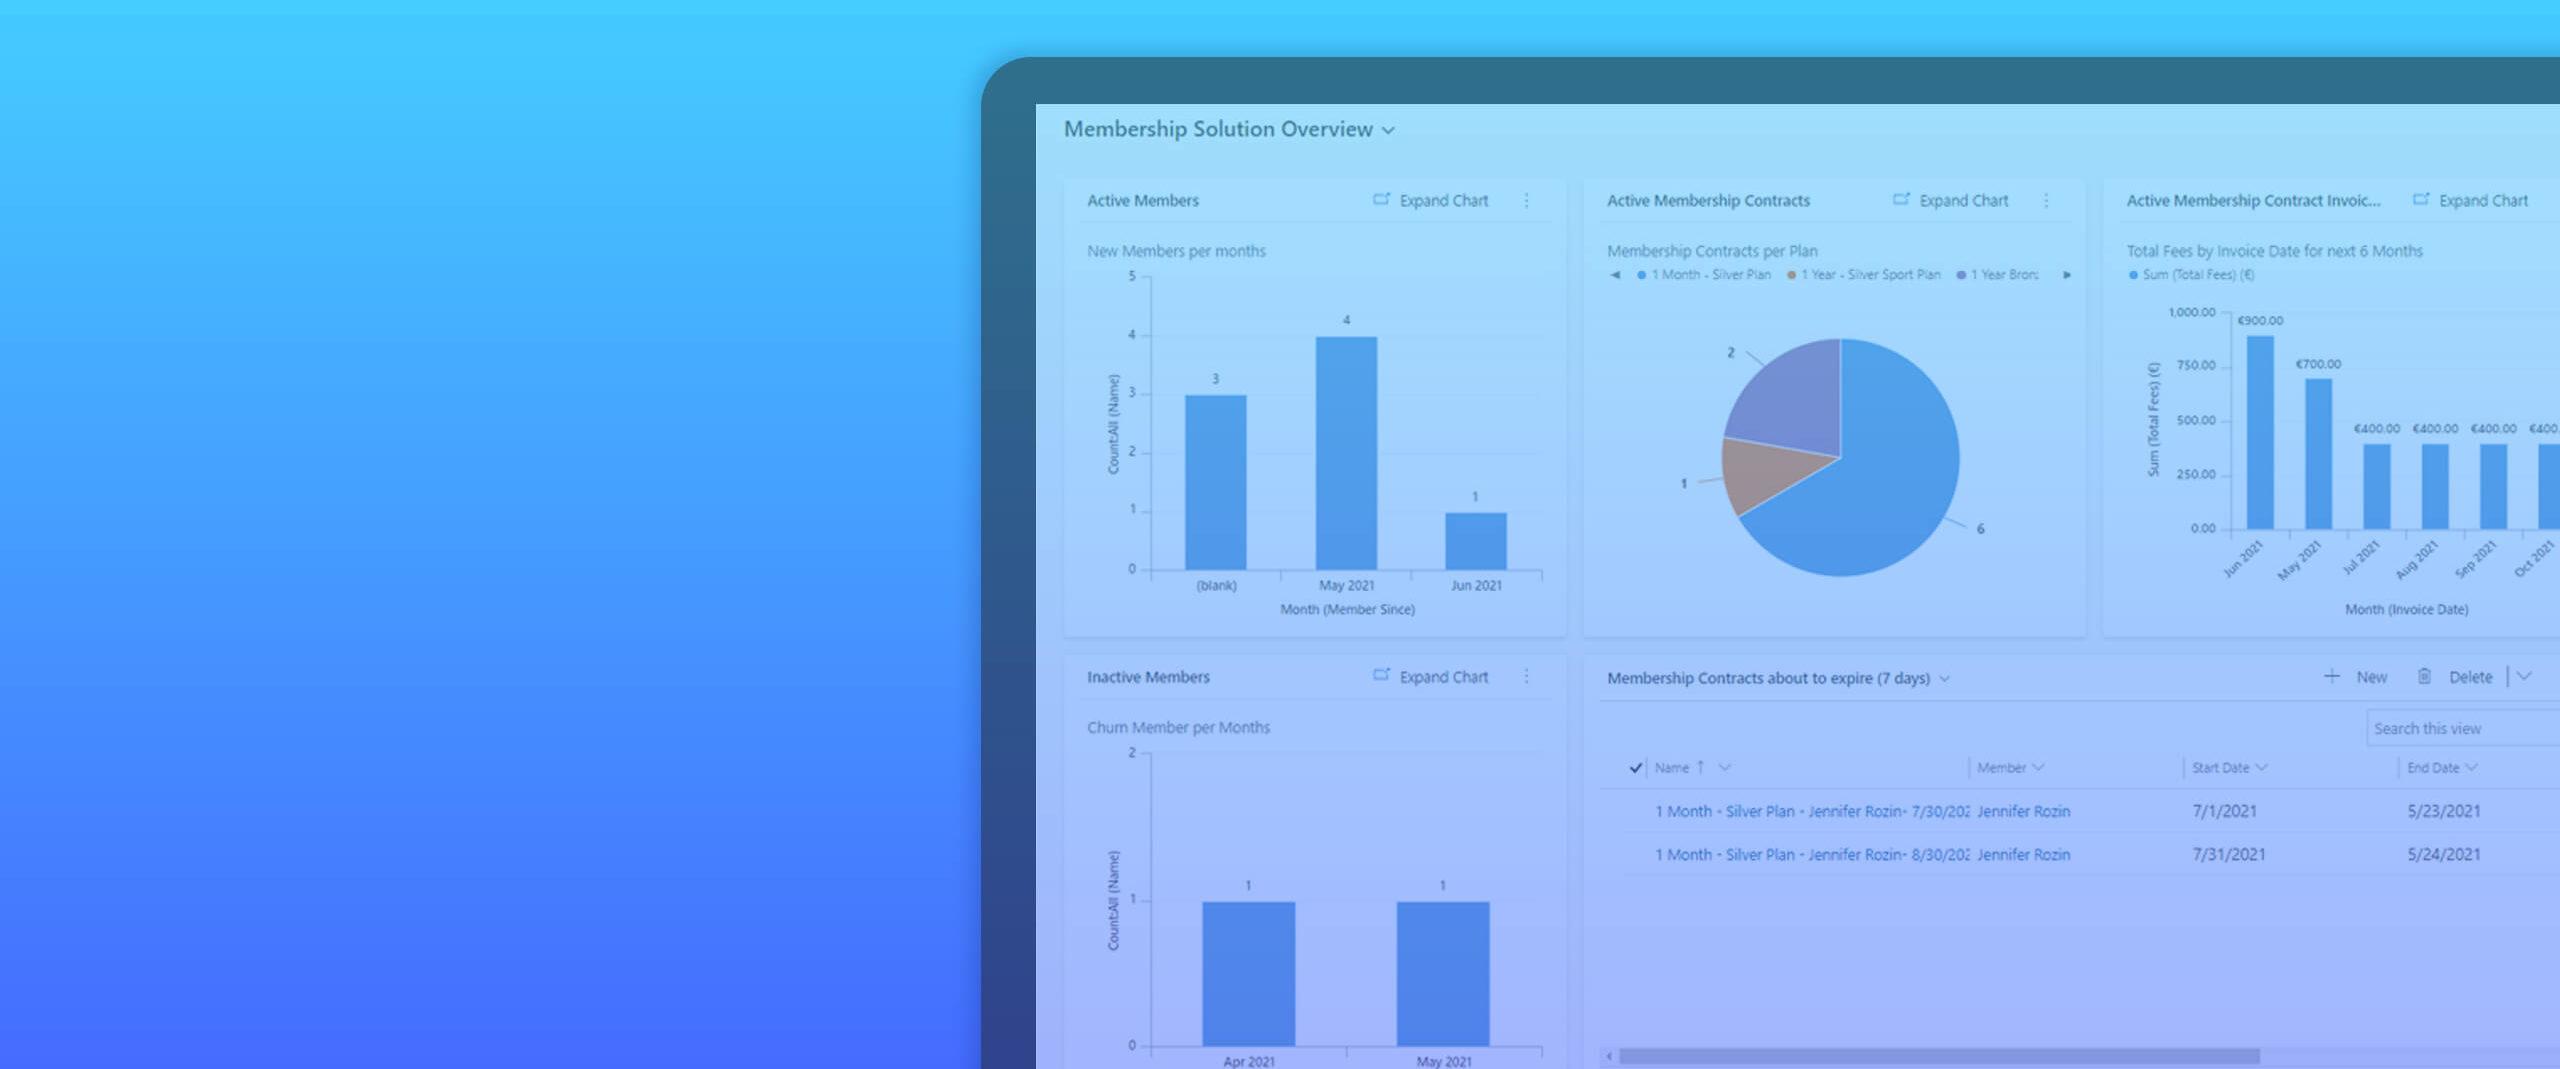 Membership solution for Dynamics 365 Customer Engagement header